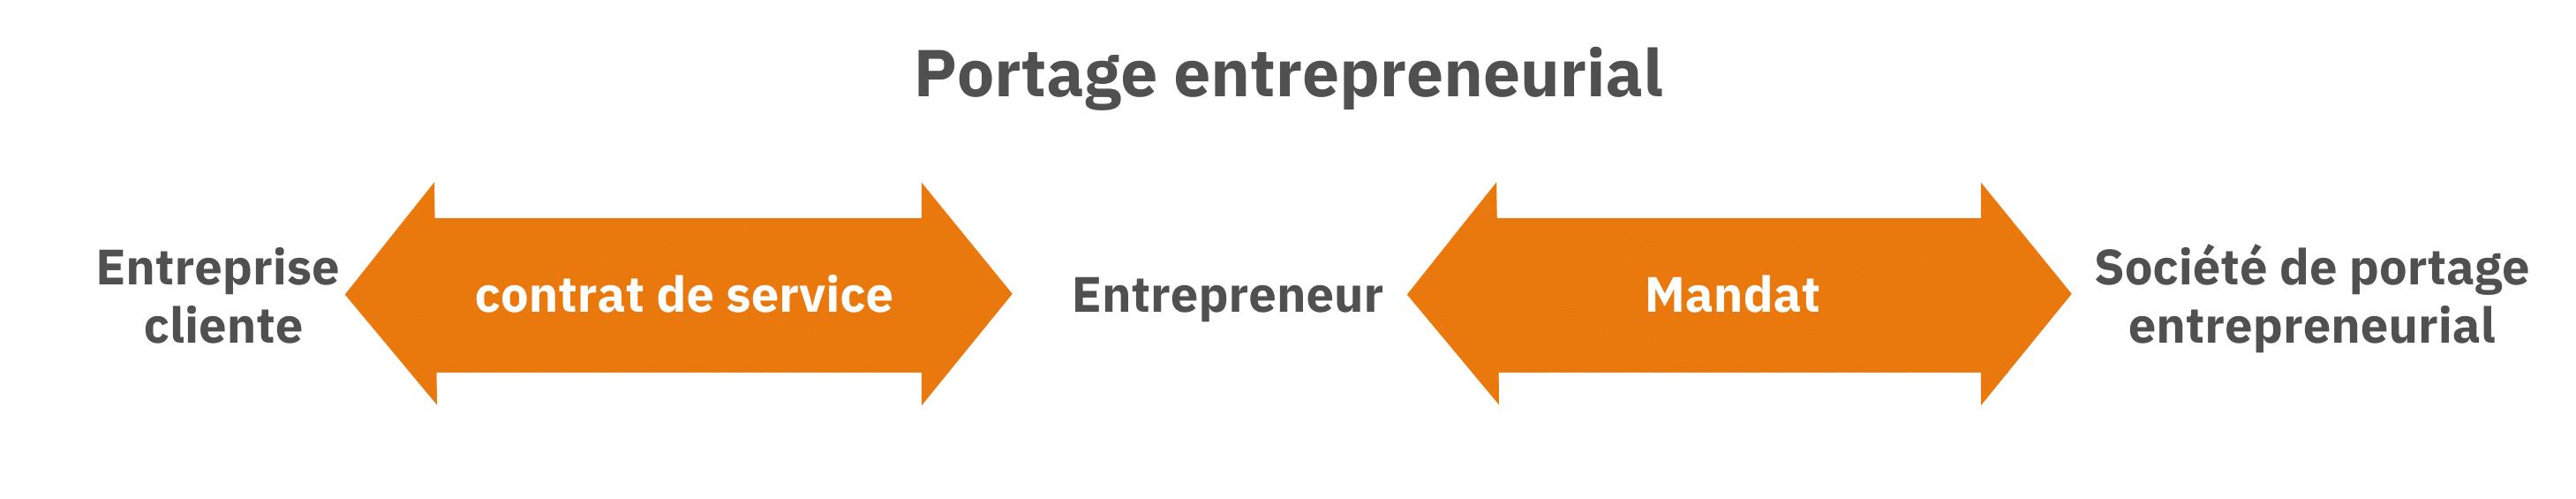 Organisation du portage entrepreneurial